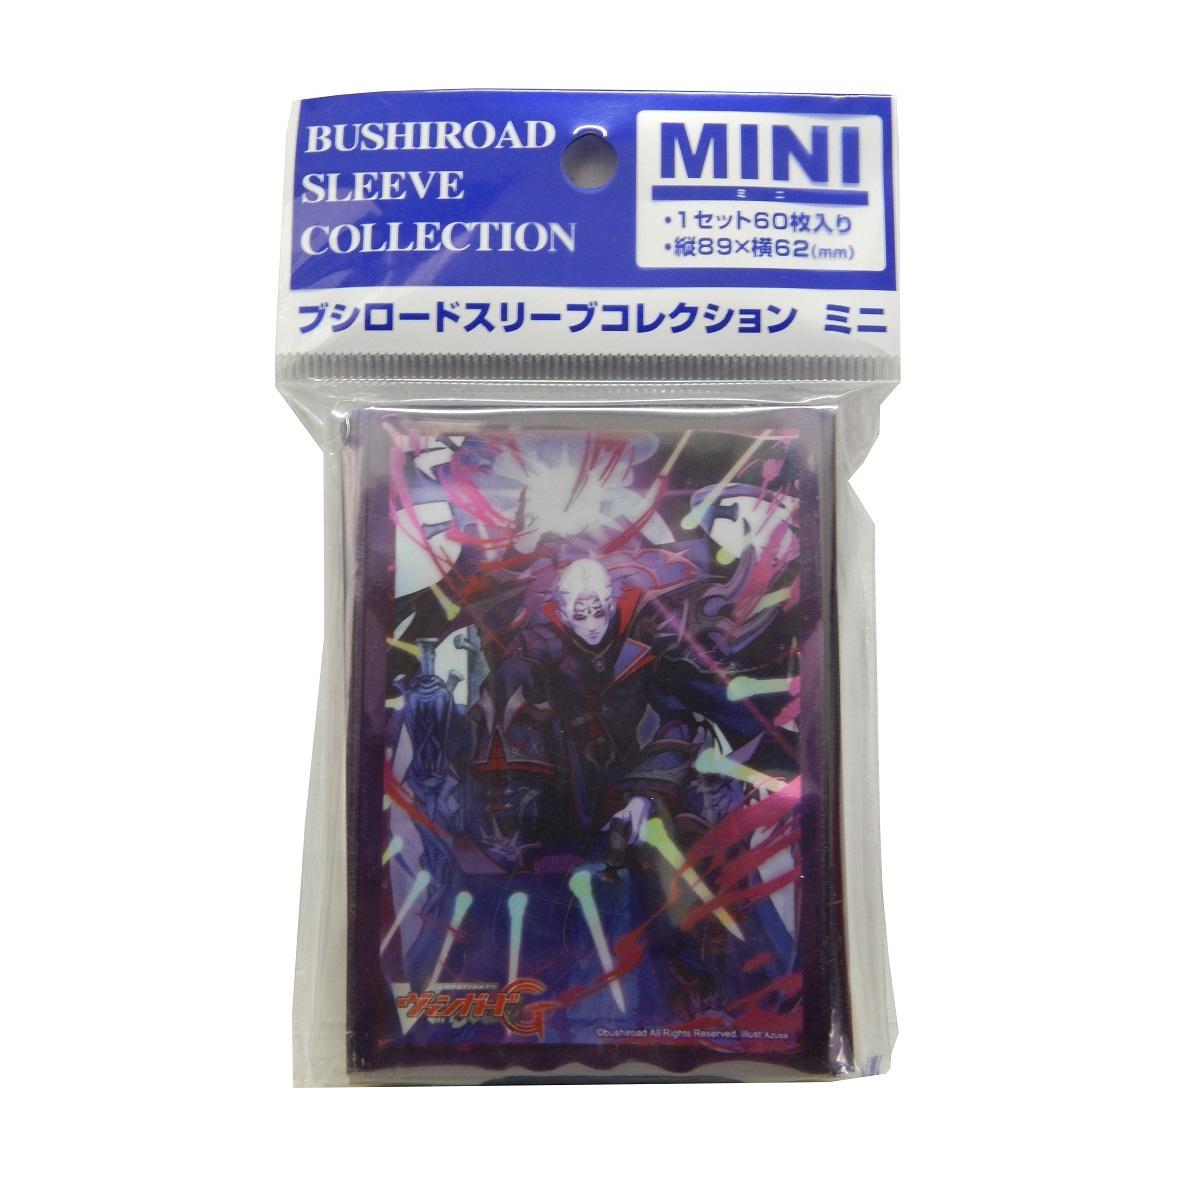 Bushiroad Sleeve Collection Mini Vol.148